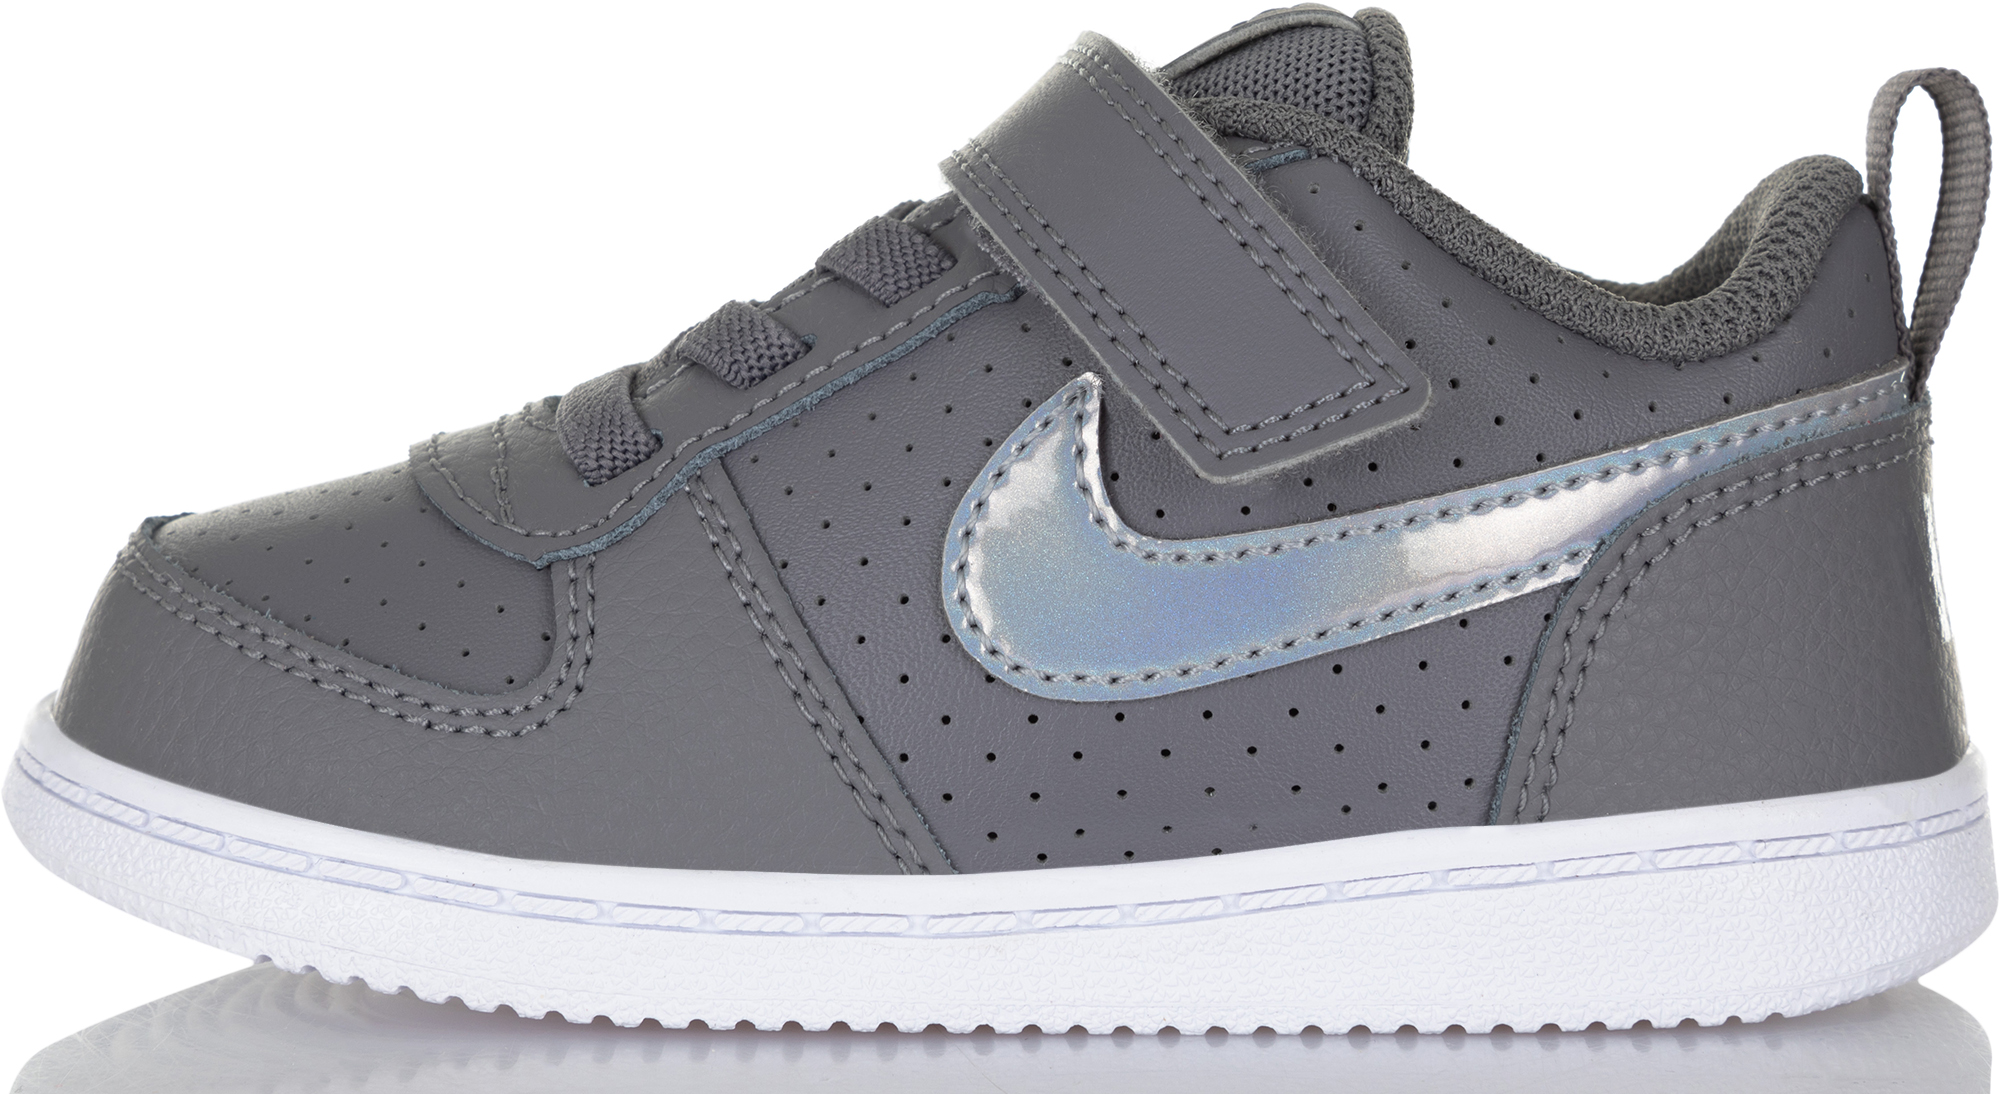 Nike Кеды для девочек Nike Court Borough Low, размер 25 цена